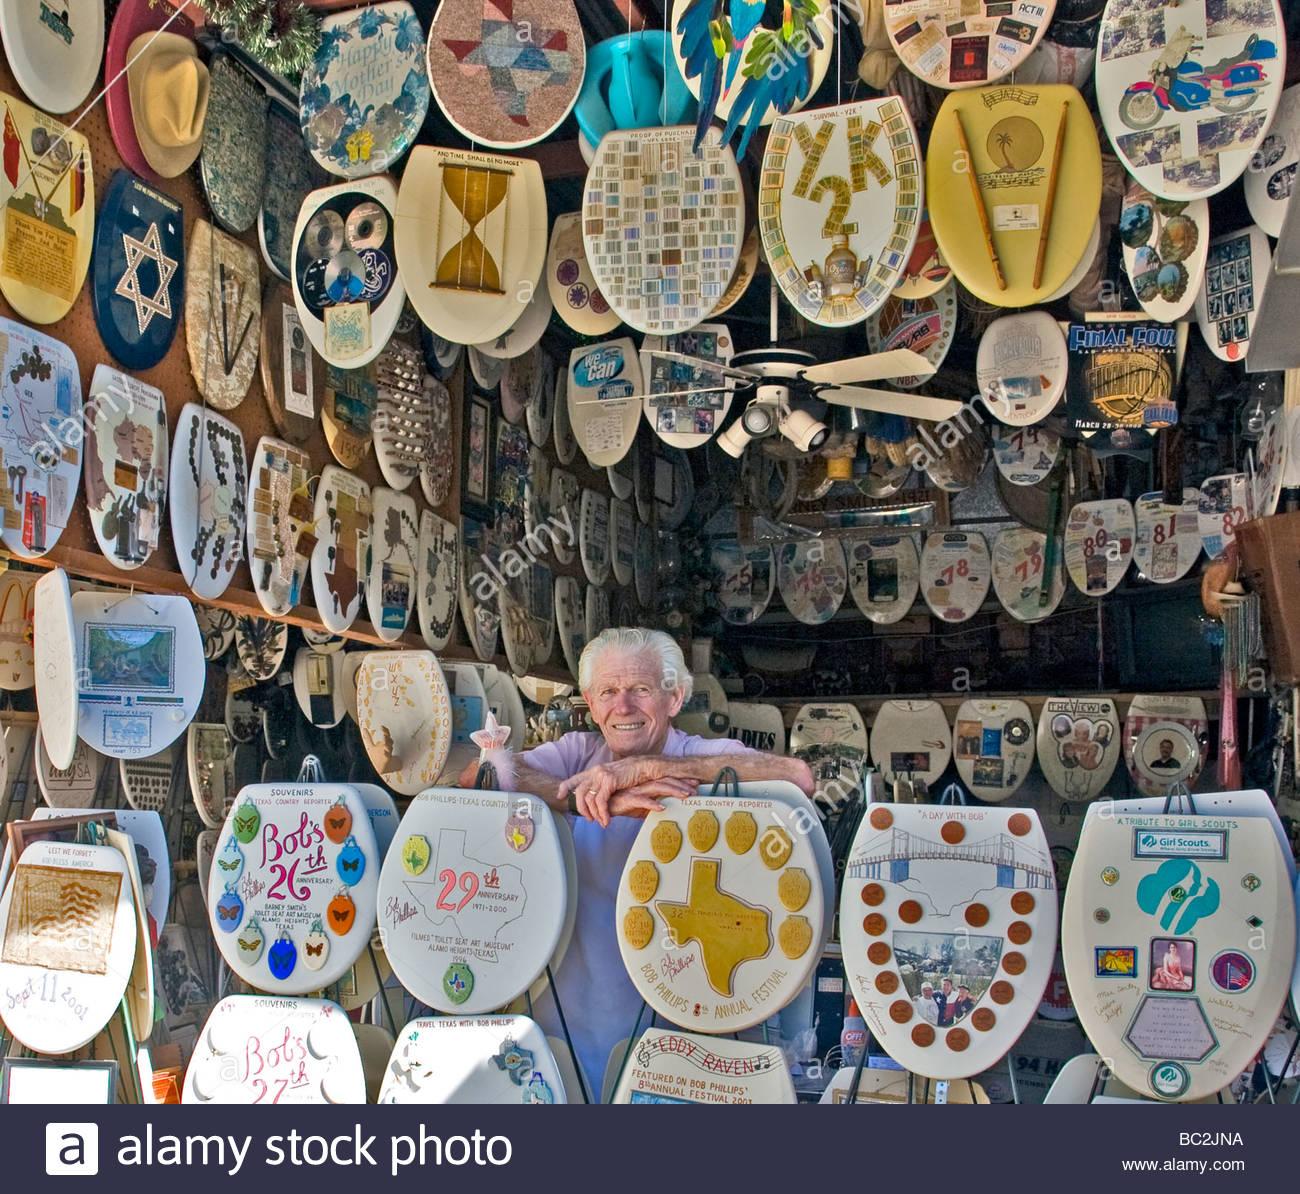 Toilet seat museum in San Antonio, Texas Stock Photo   Alamy